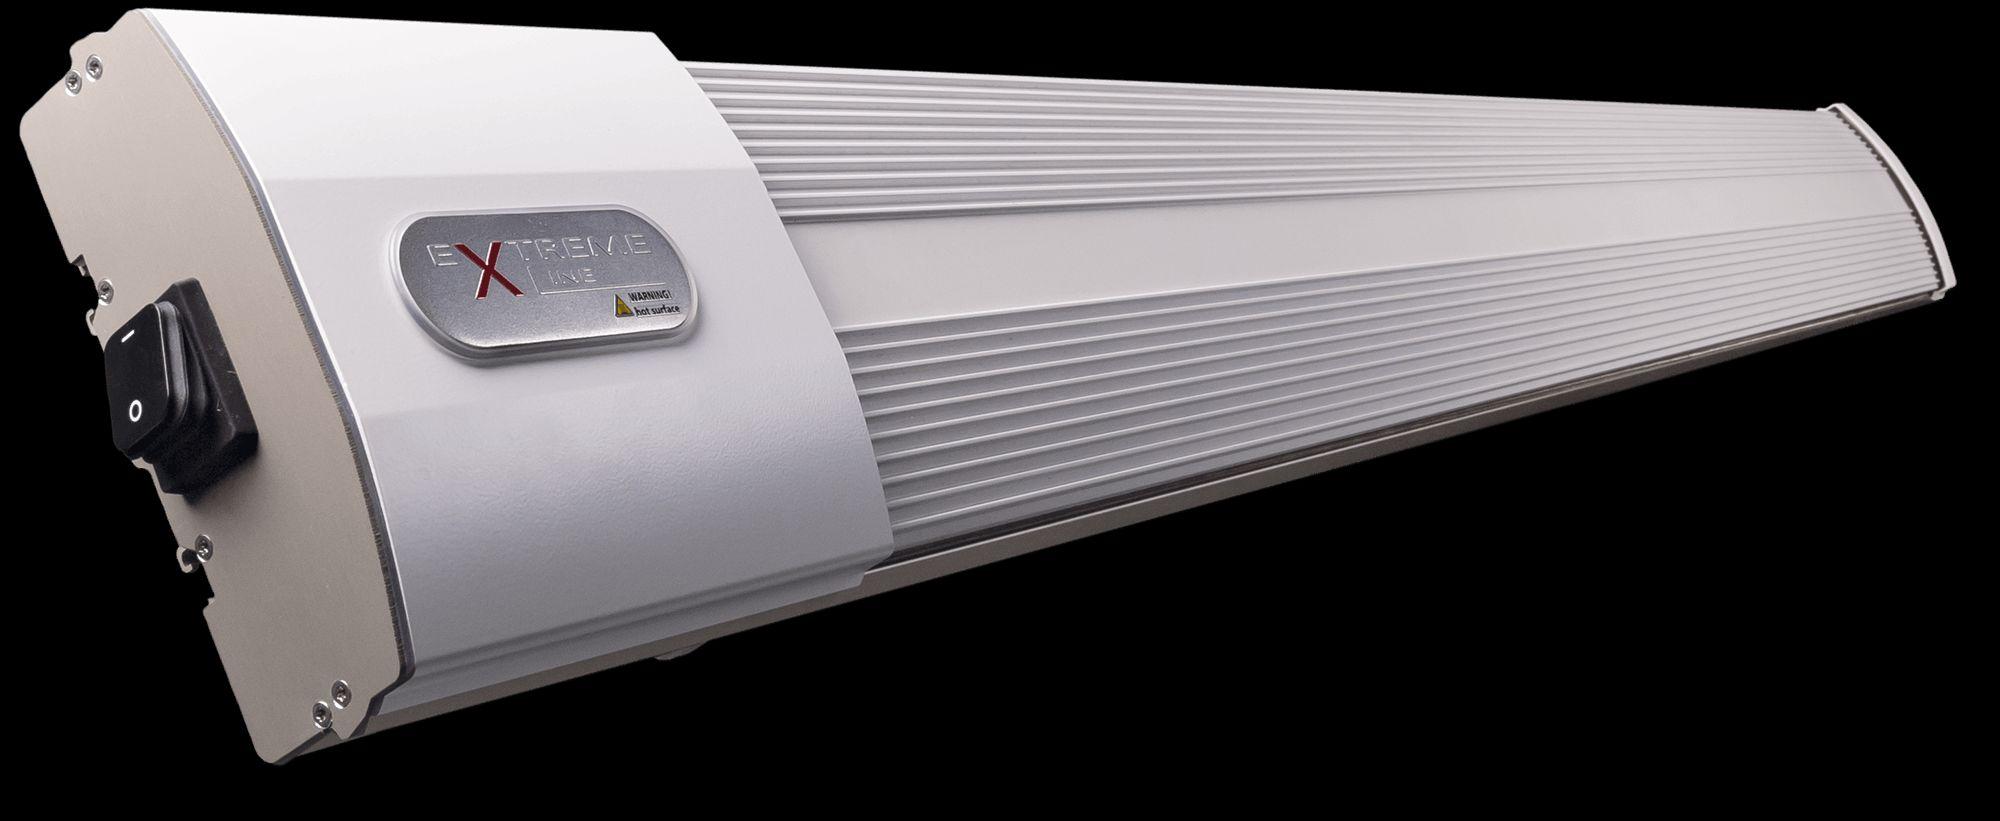 ExtremeLine Infrarotdunkelstrahler  HEAT ZONE 3200W